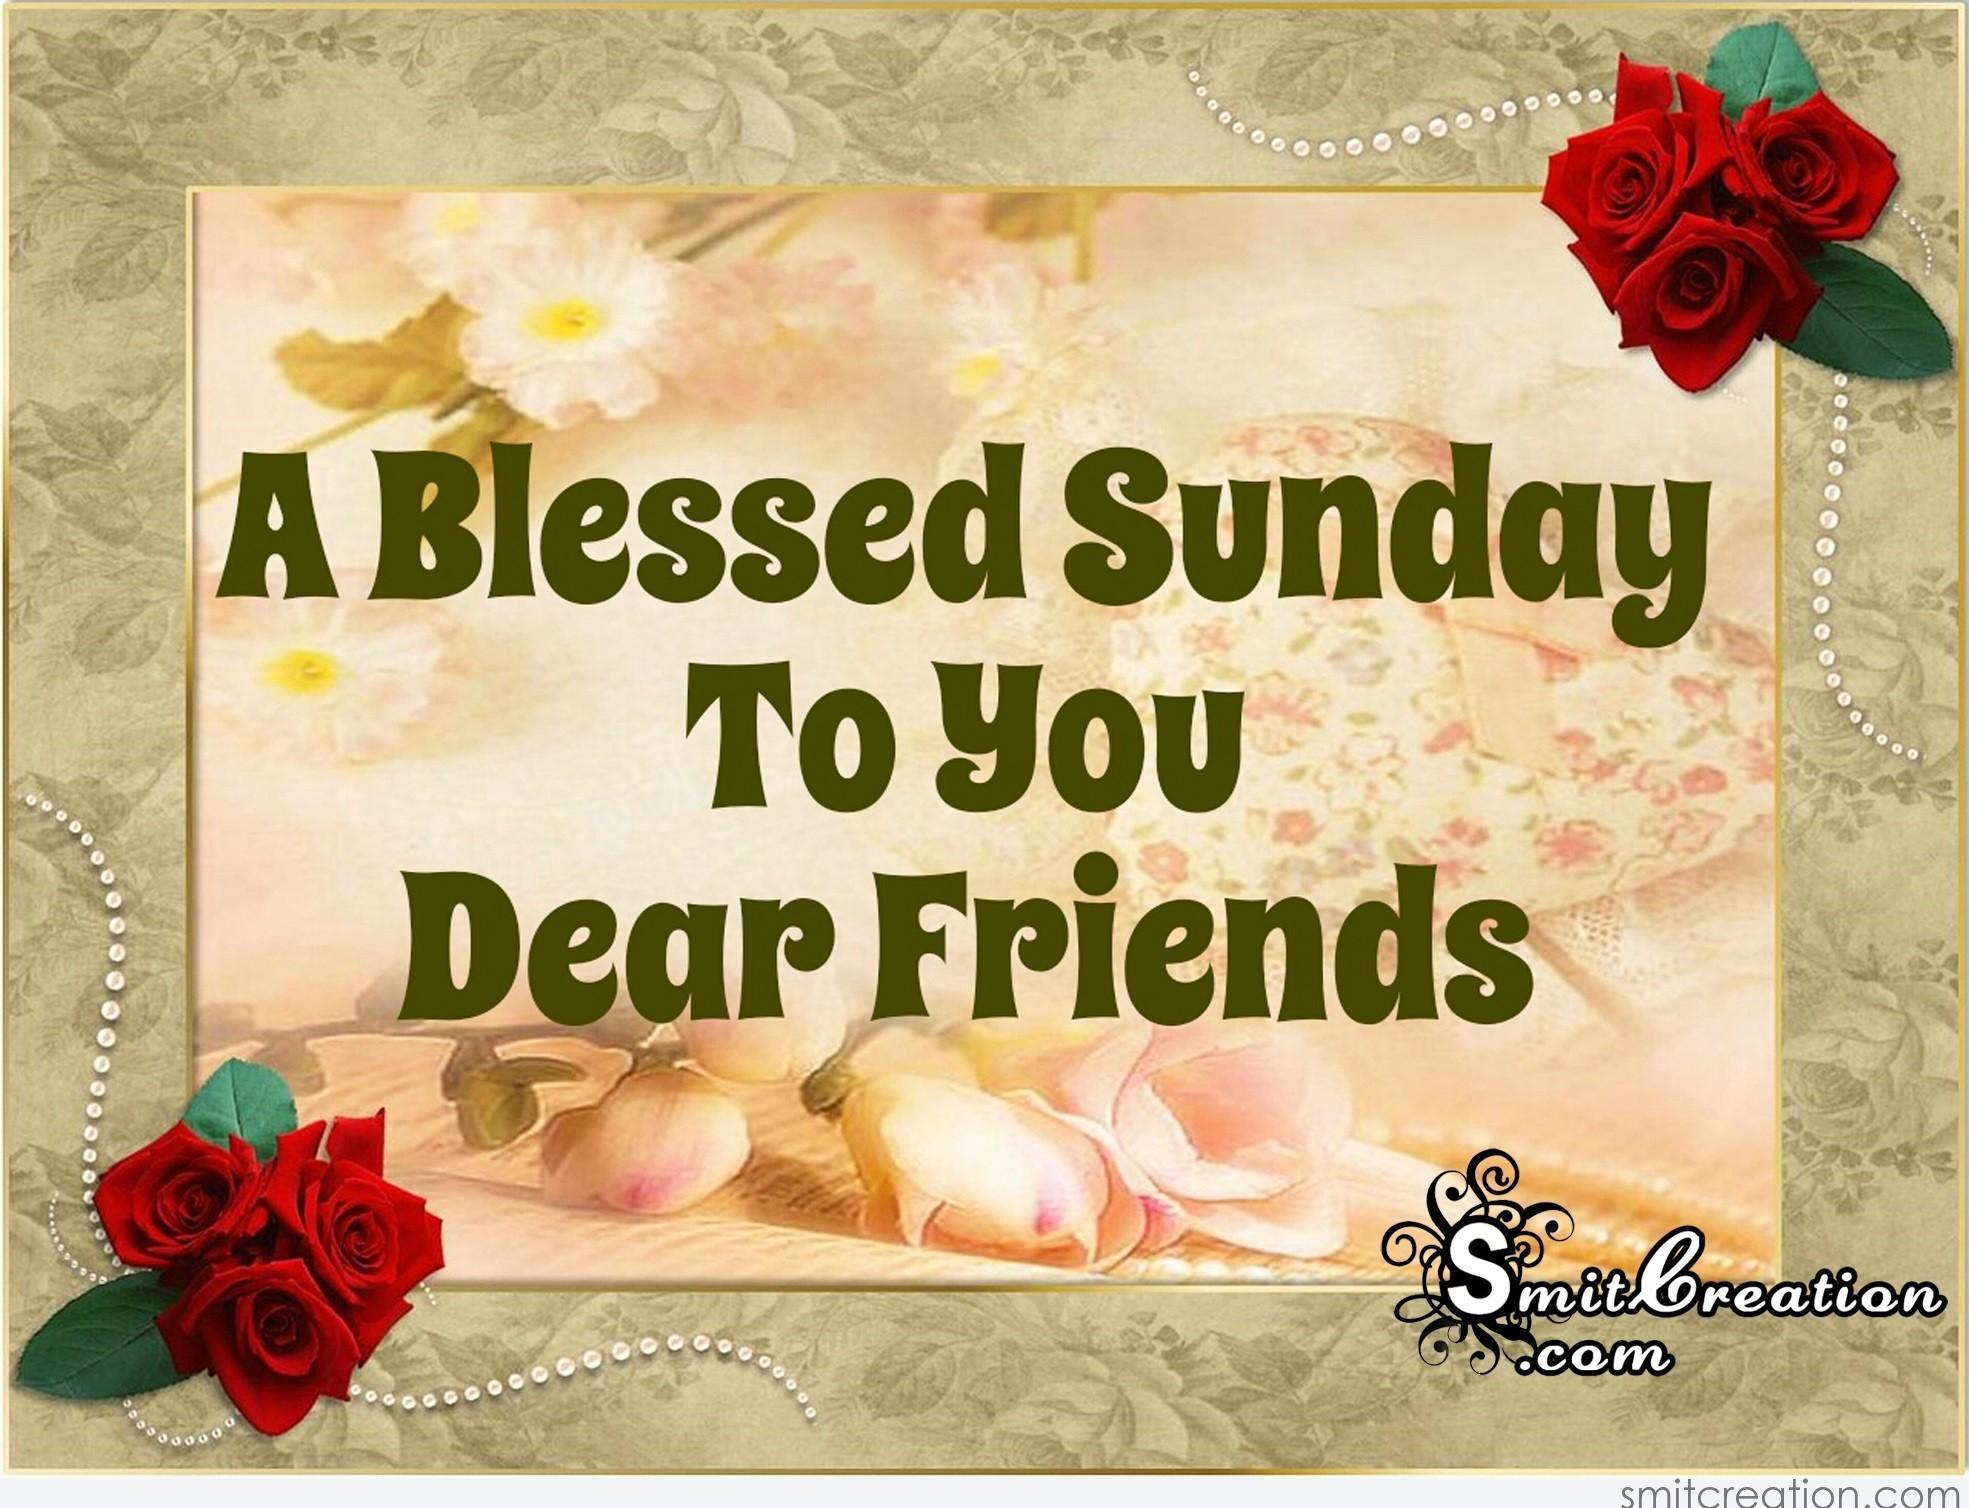 A Blessed Sunday To You Dear Friends - SmitCreation.com